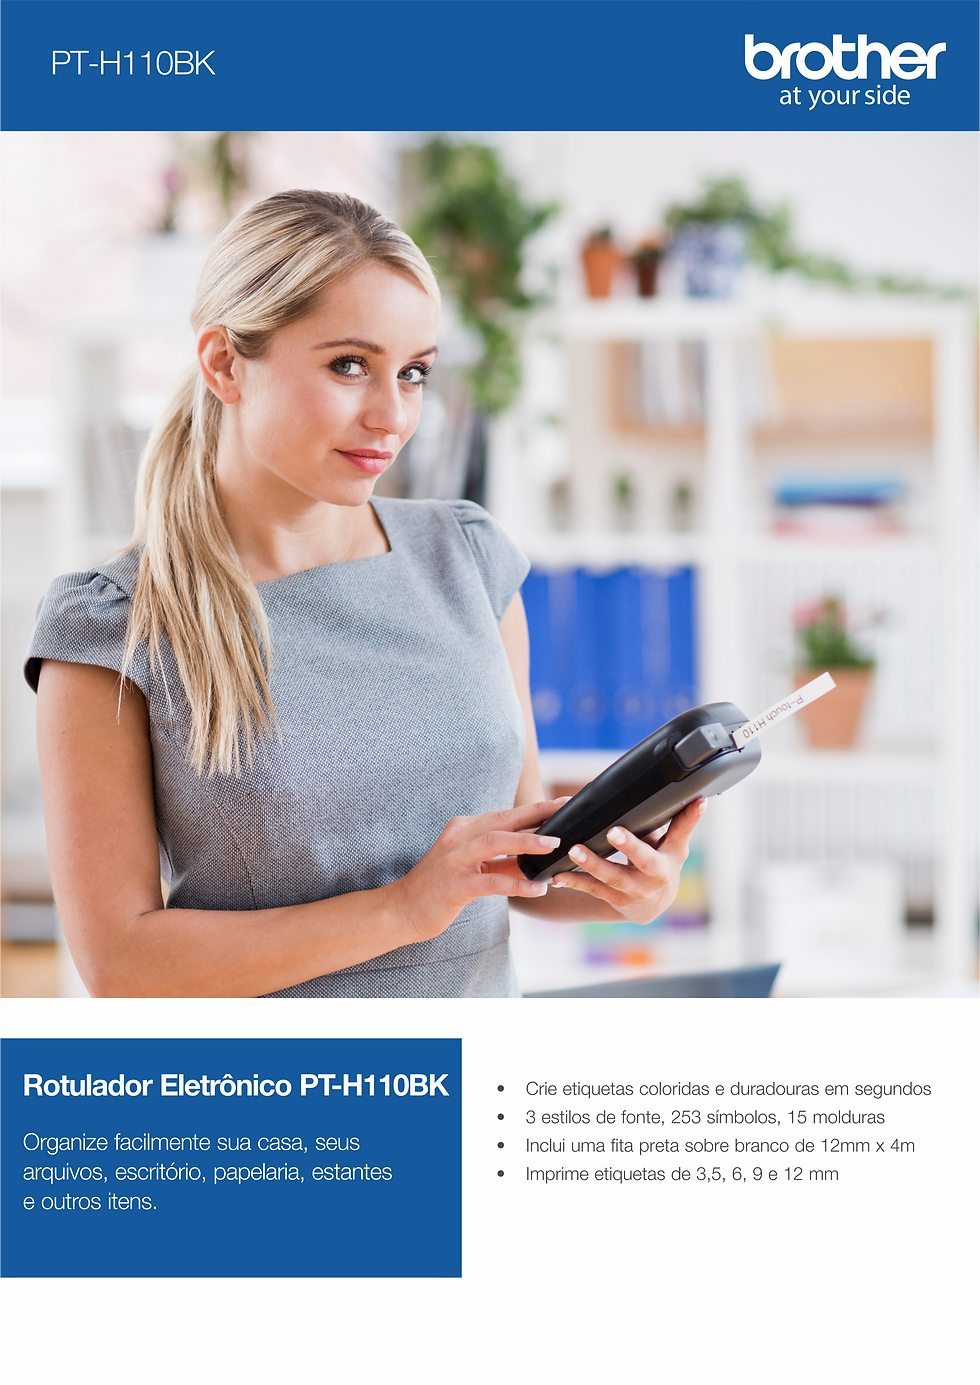 PT-H110_Brochure_H110BK-Web_1.png